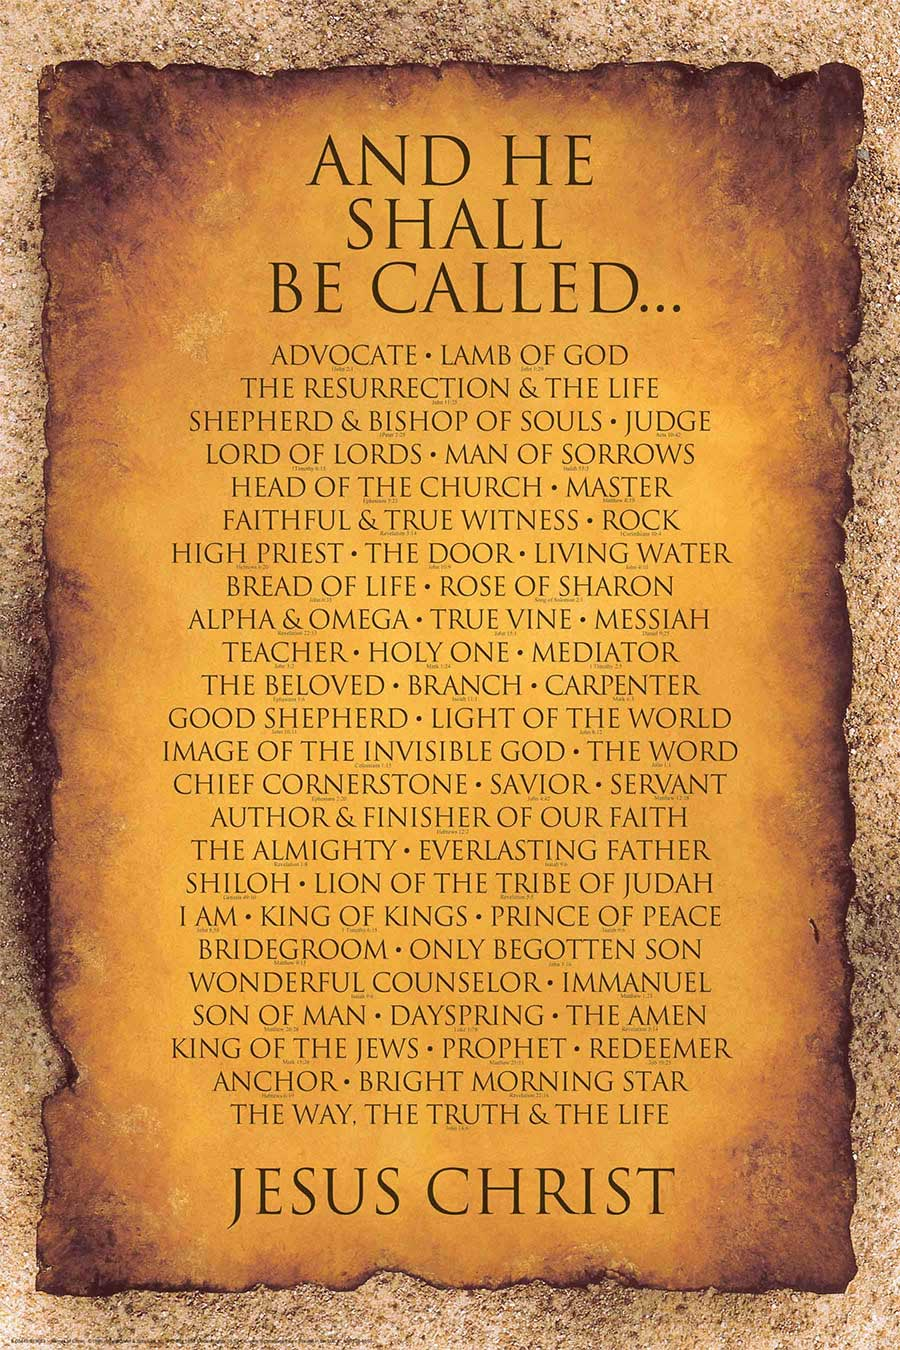 Names of Christ 24x36 - Inspiration Art